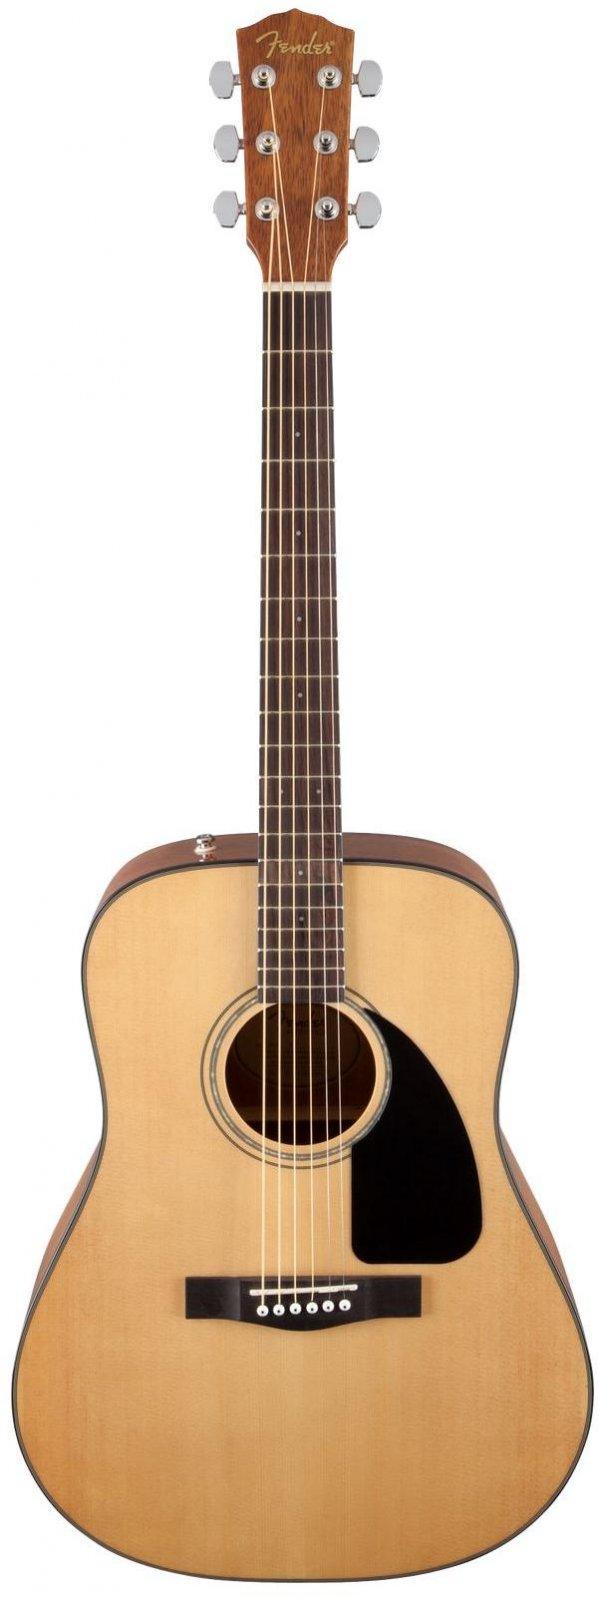 Fender CD-60 Dreadnought V3 w/Case, Walnut Fingerboard - Natural